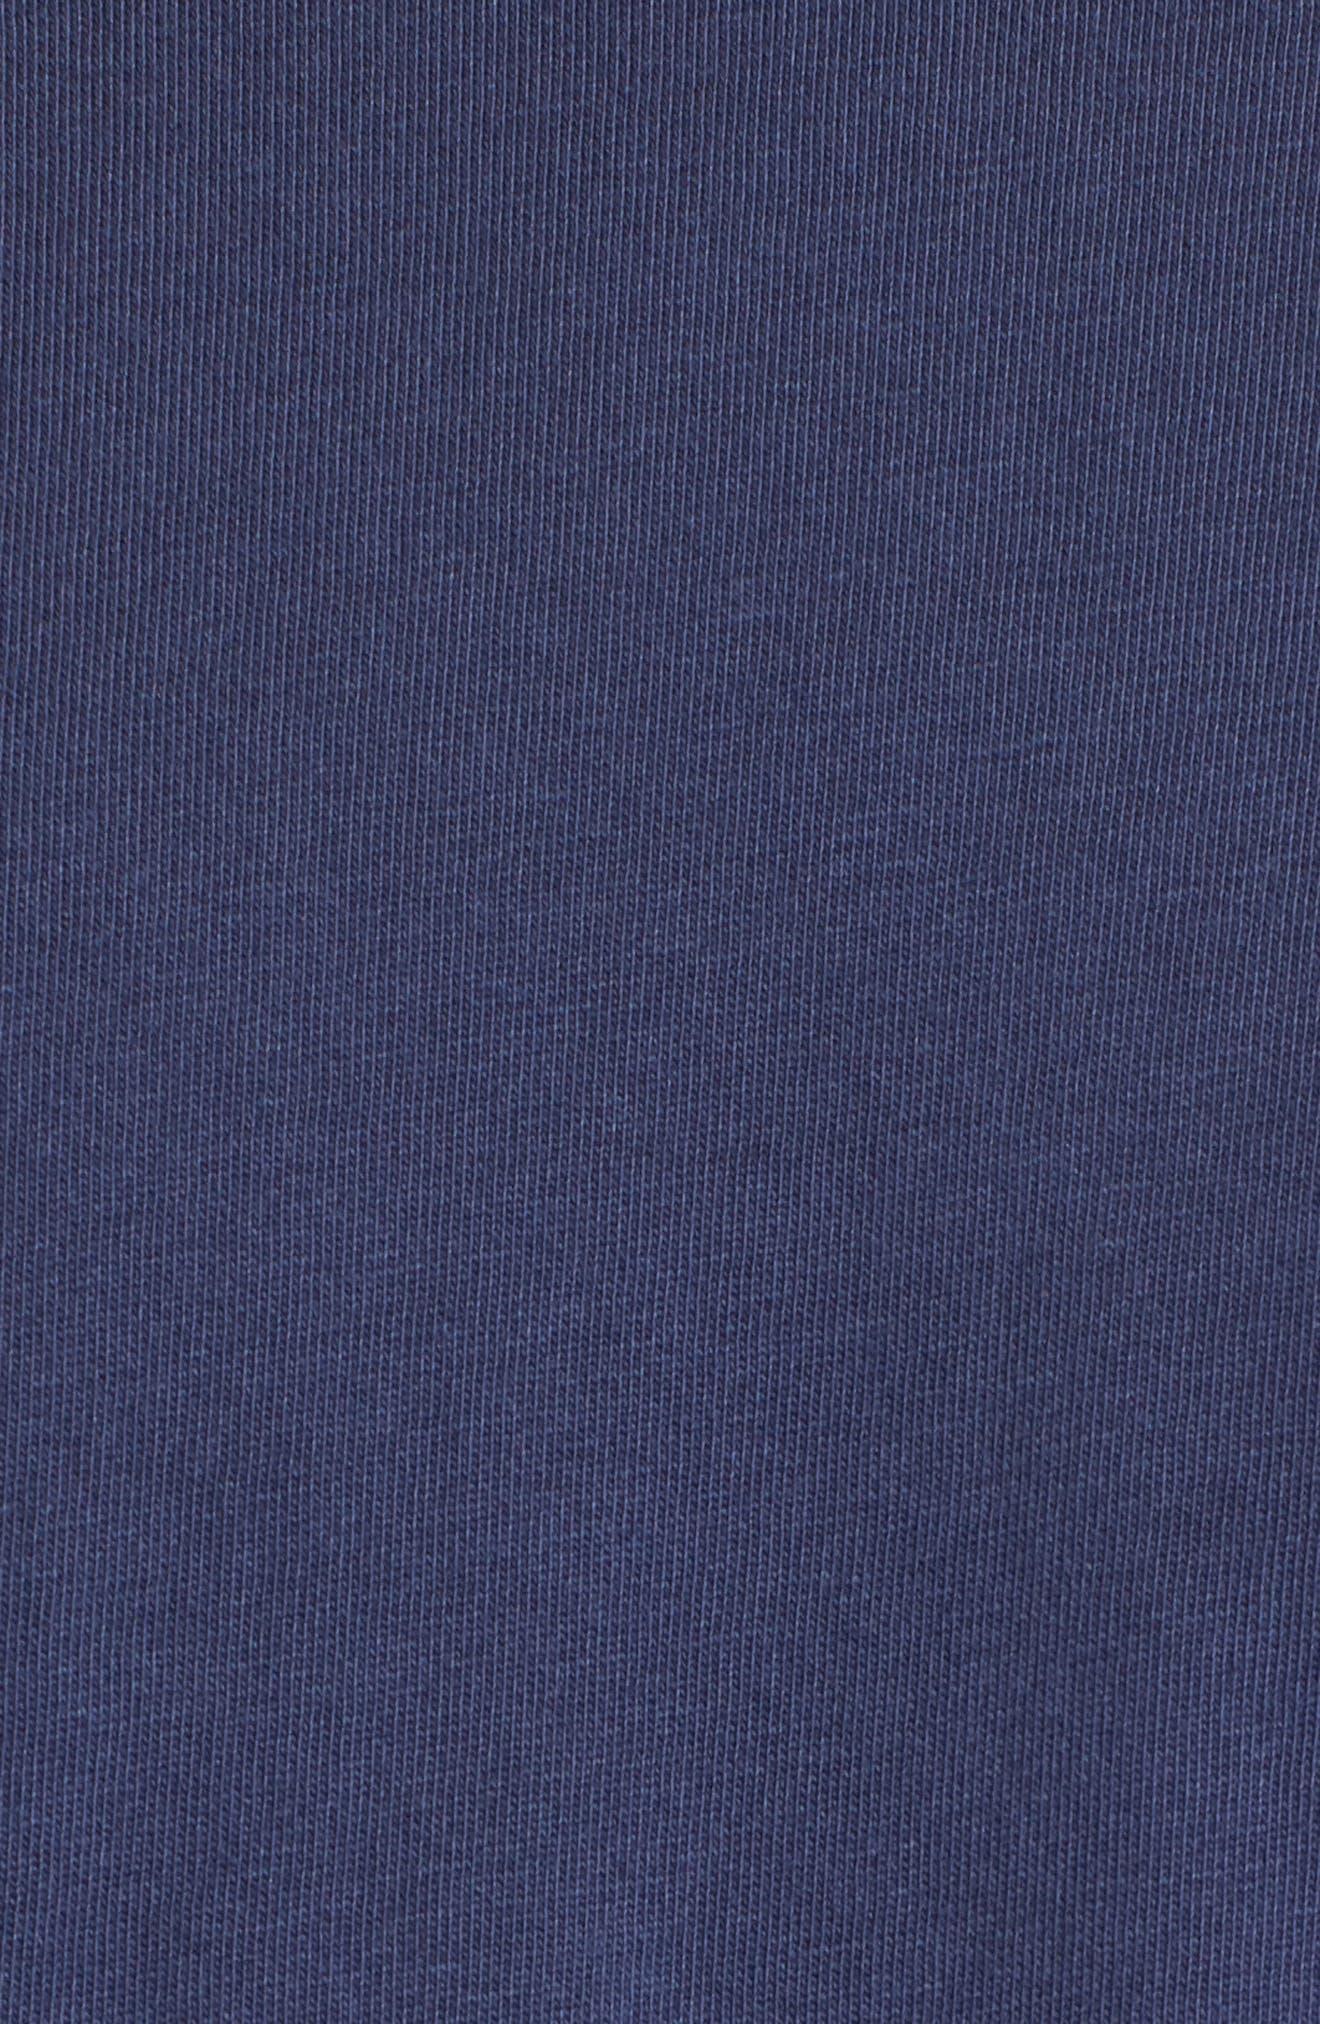 x Pendleton Grand Canyon Patch T-Shirt,                             Alternate thumbnail 5, color,